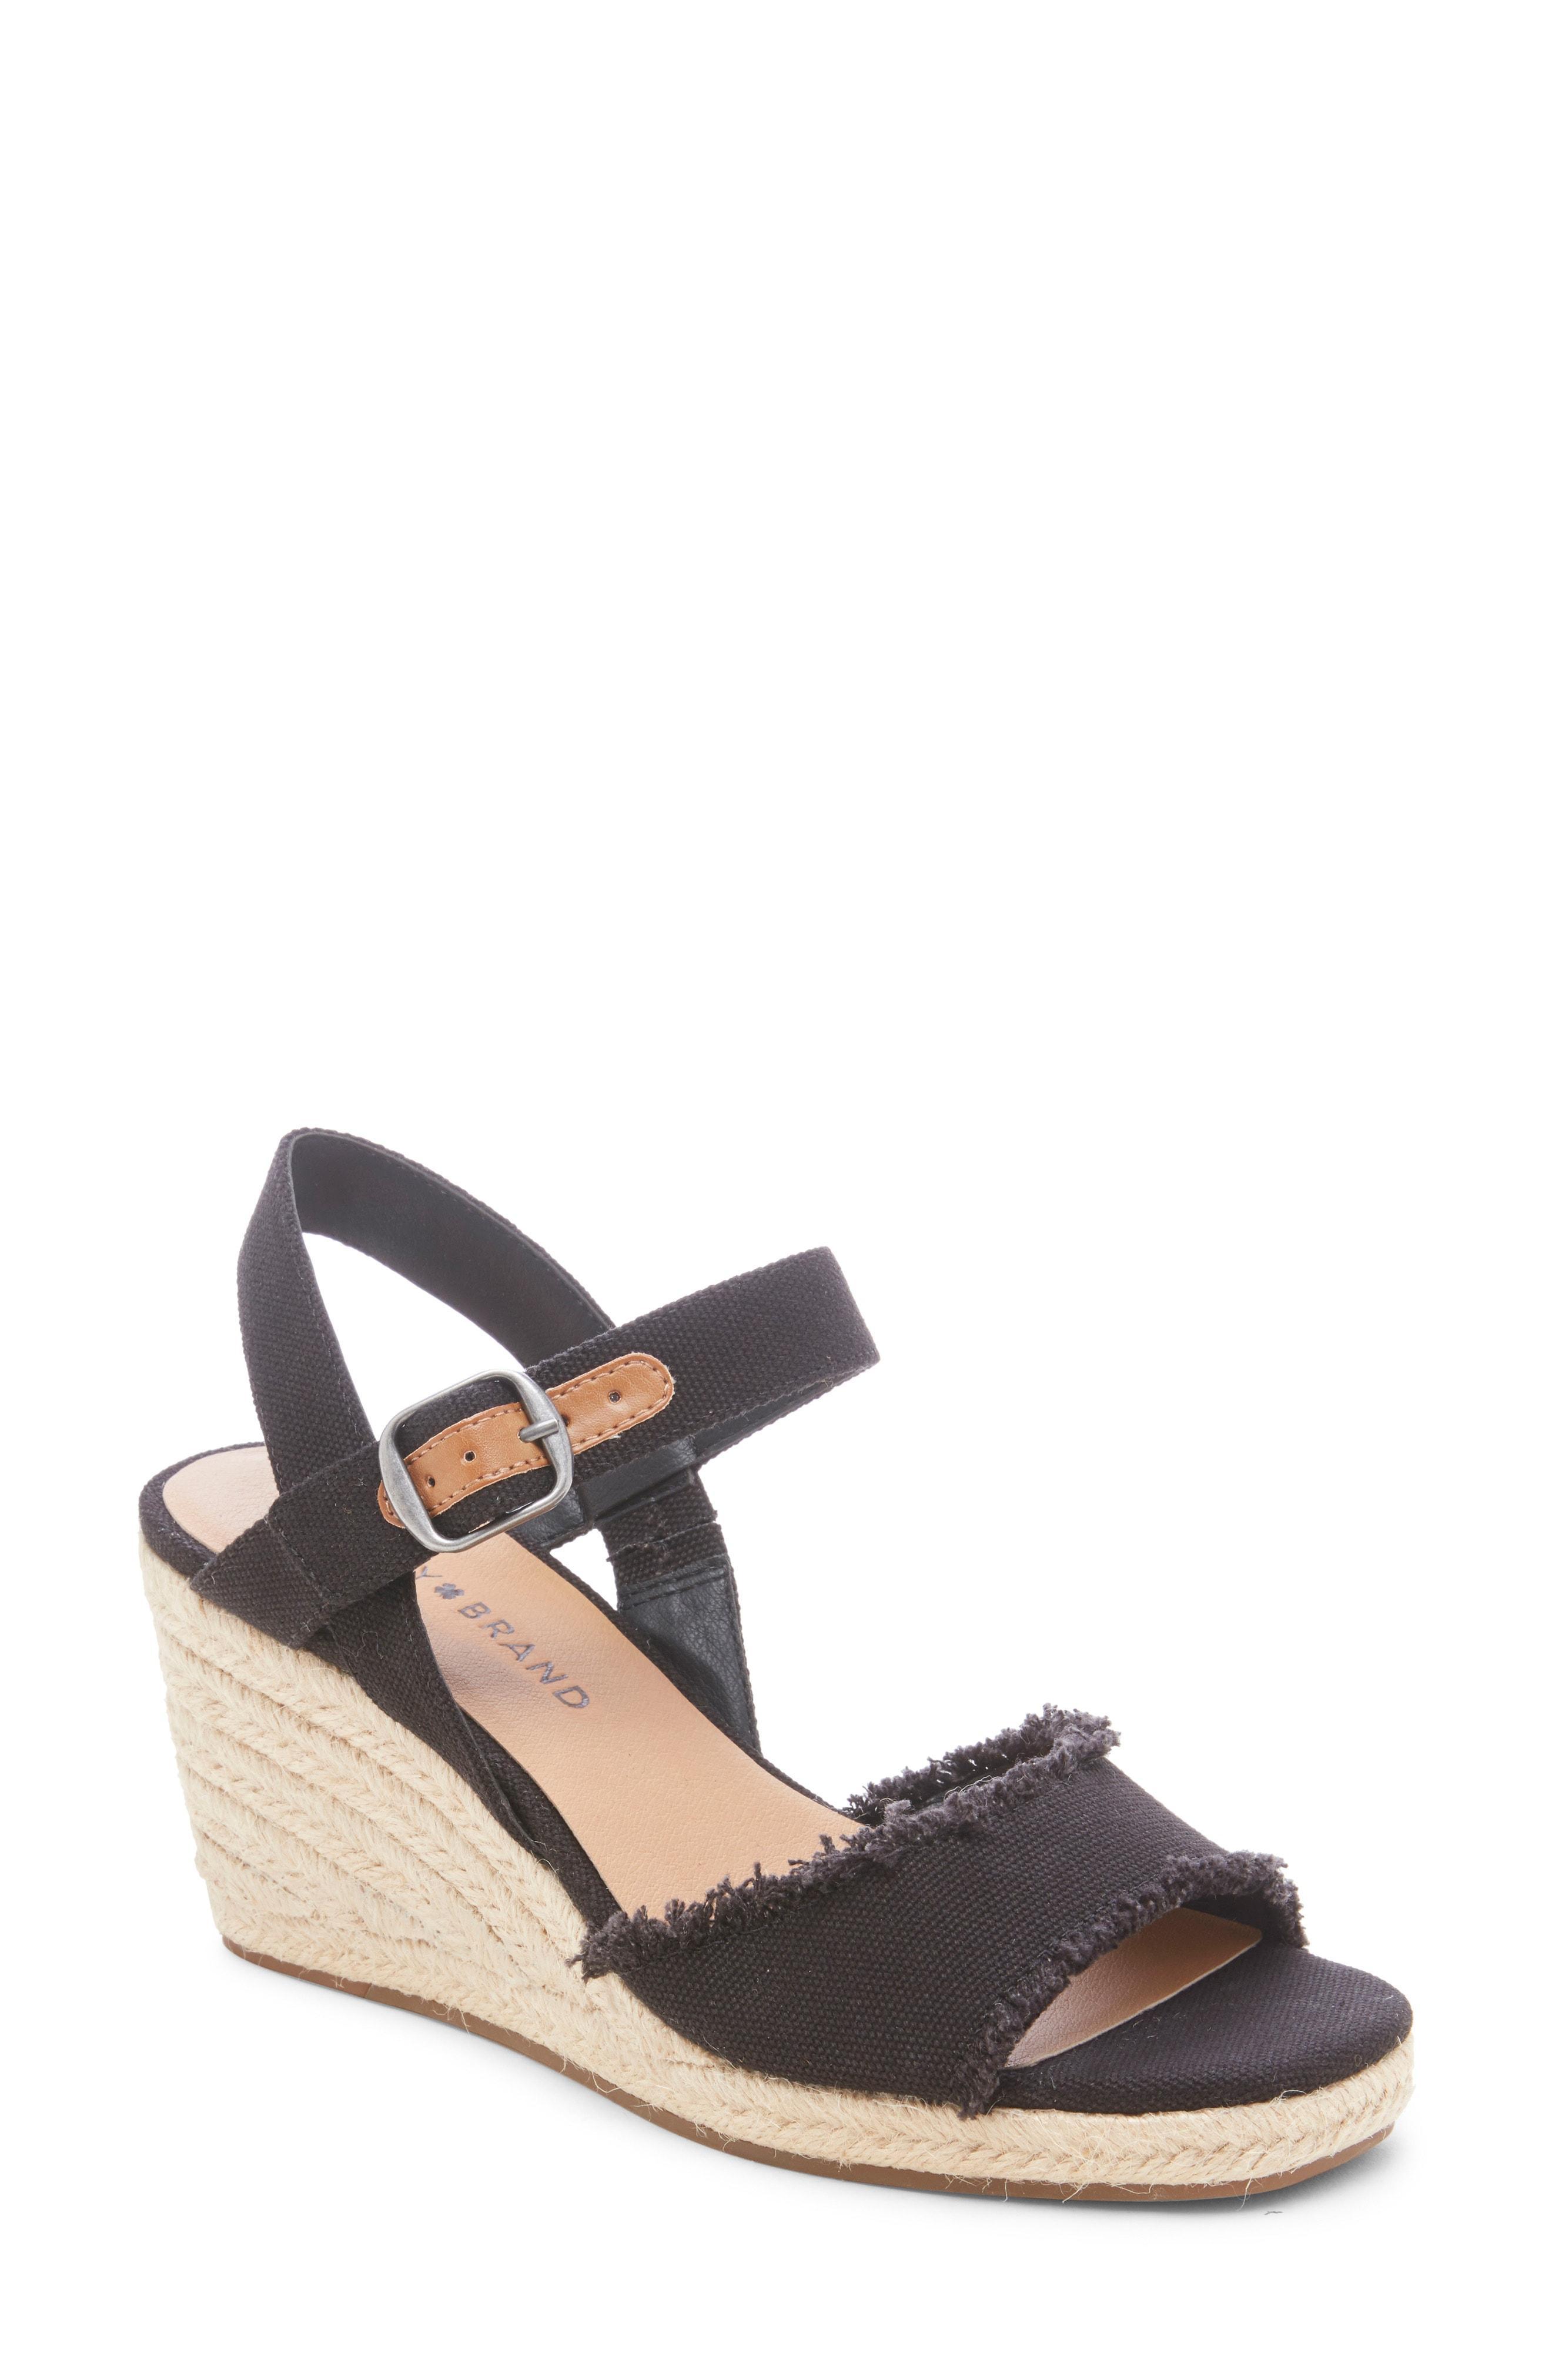 de88048a760 Lyst - Lucky Brand Mindra Espadrille Wedge Sandal